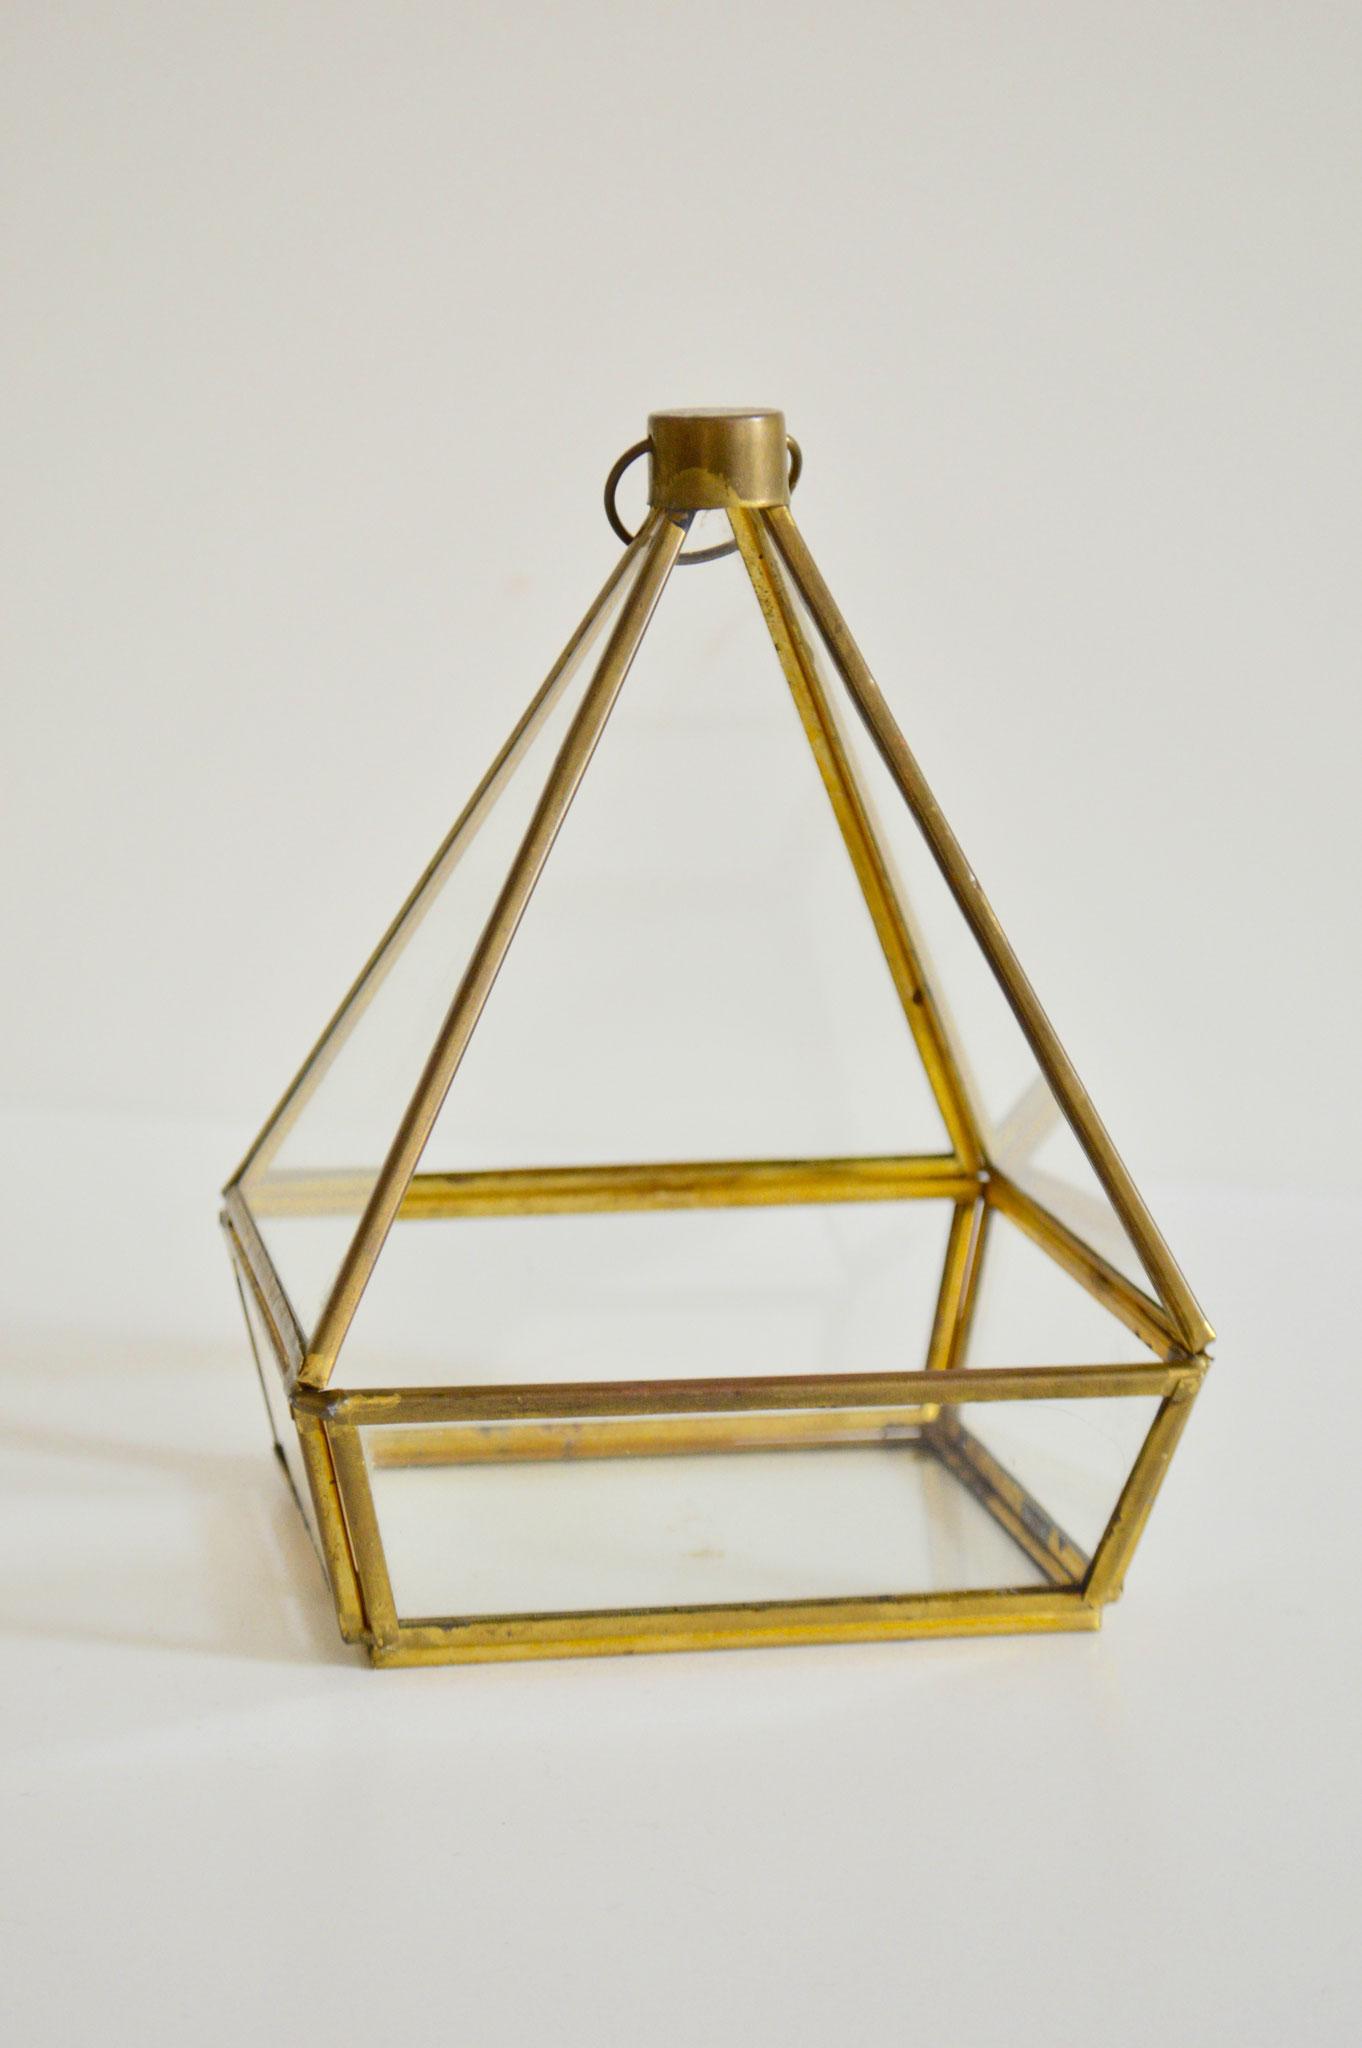 A) € 4, Einzelstück, Höhe ca. 15 cm, Breite ca. 12 cm